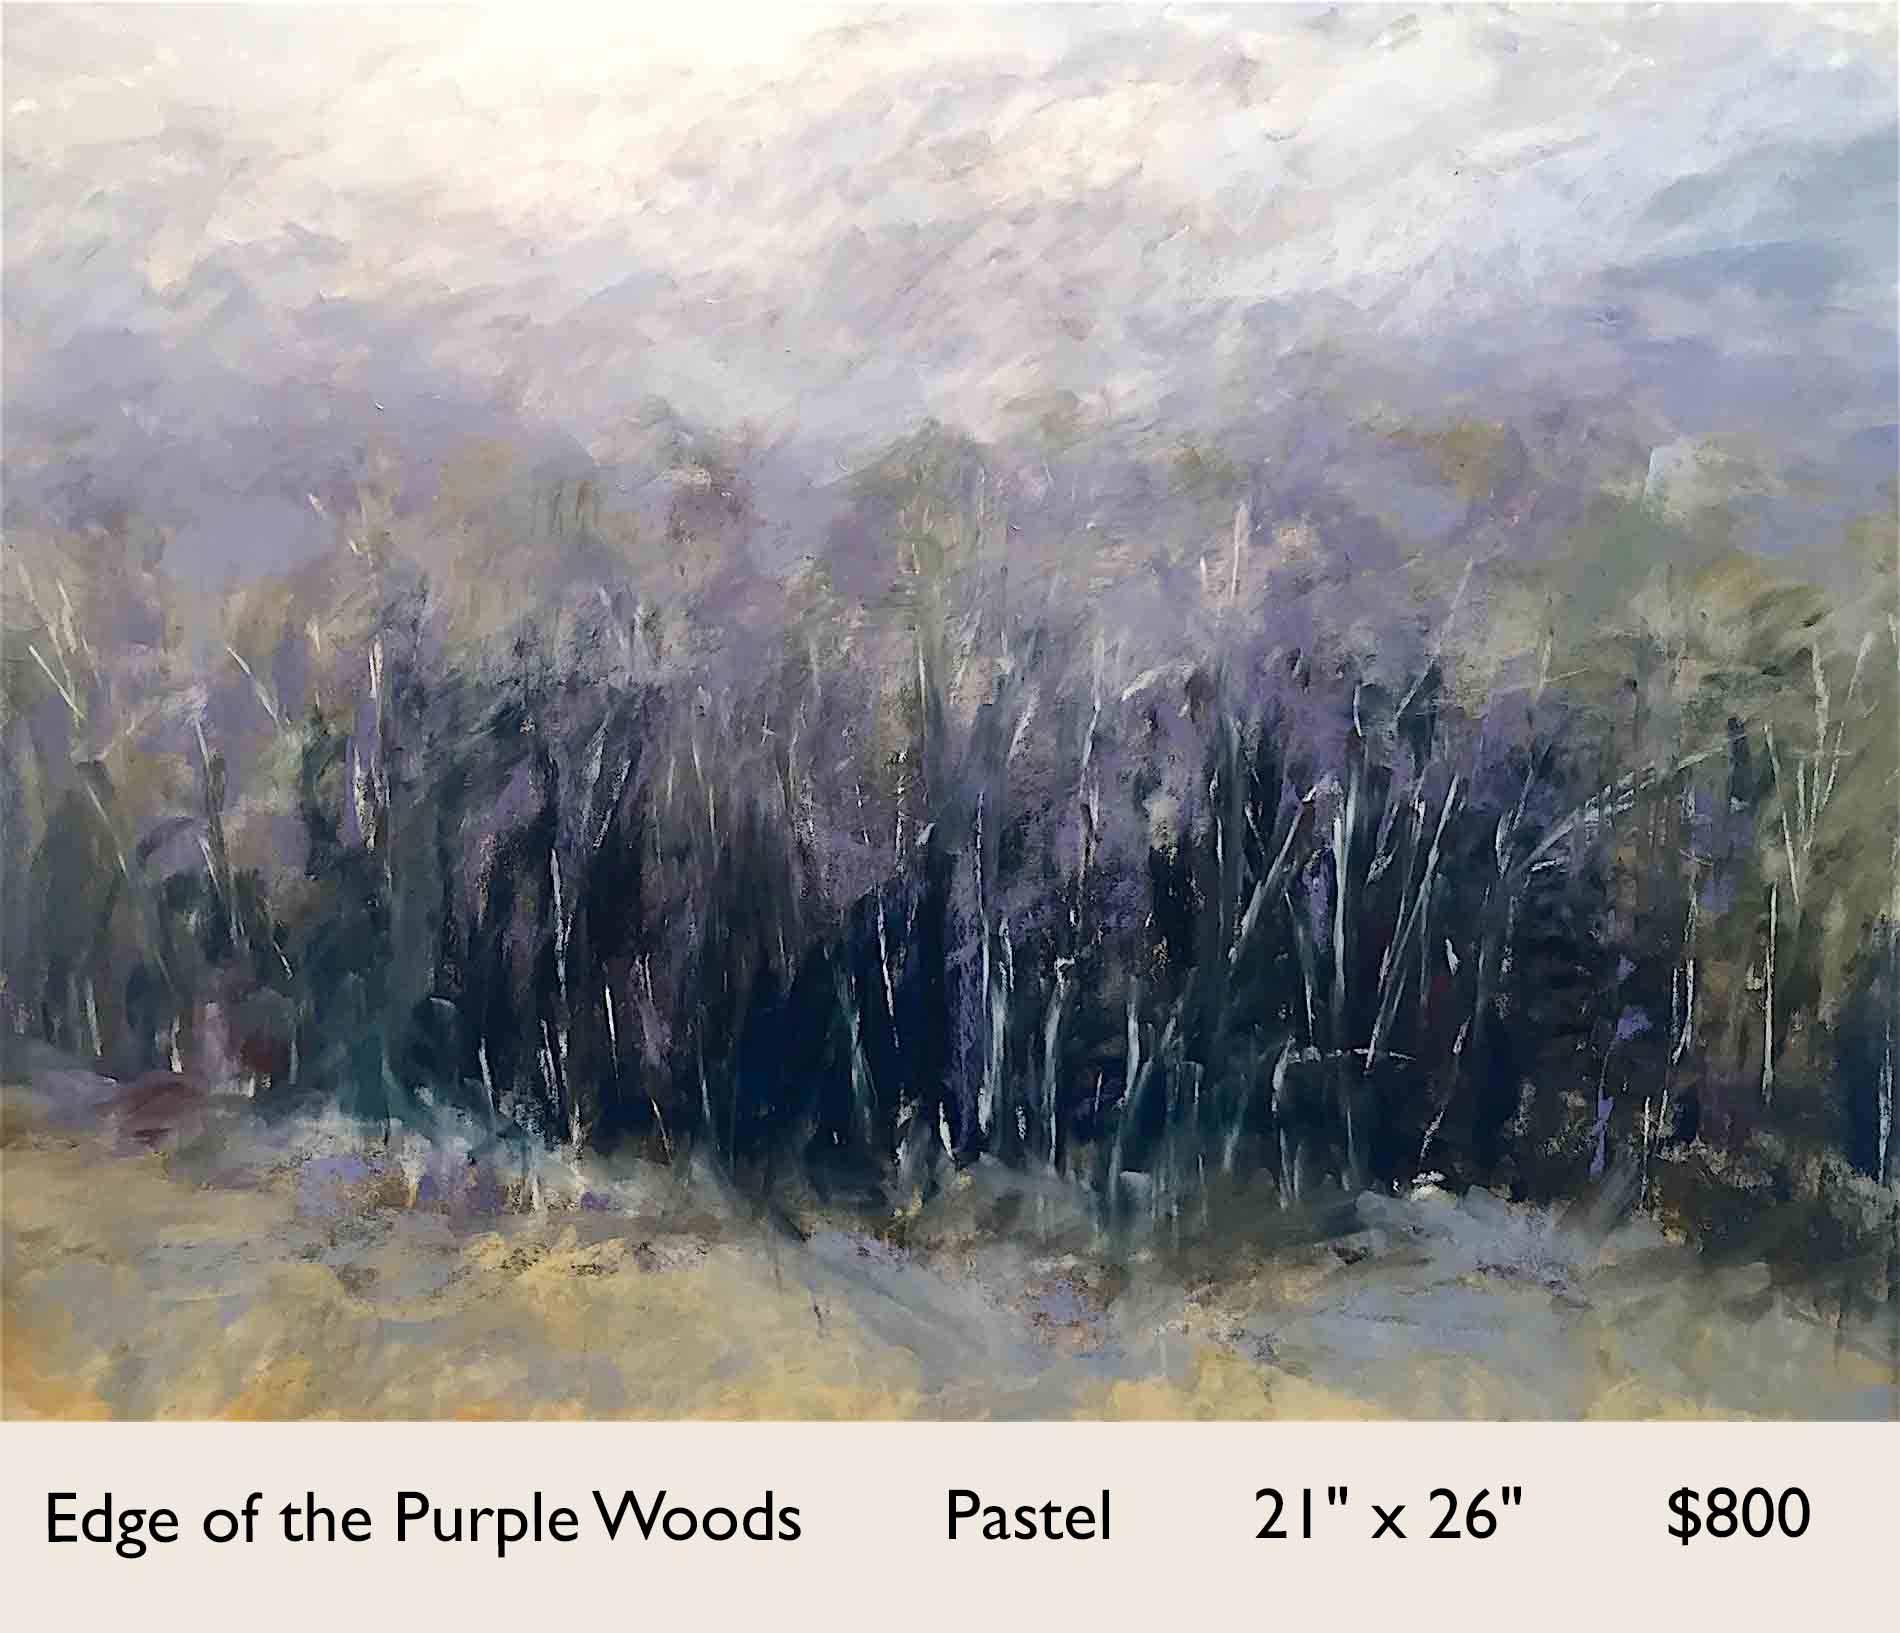 Edge of the Purple Woods